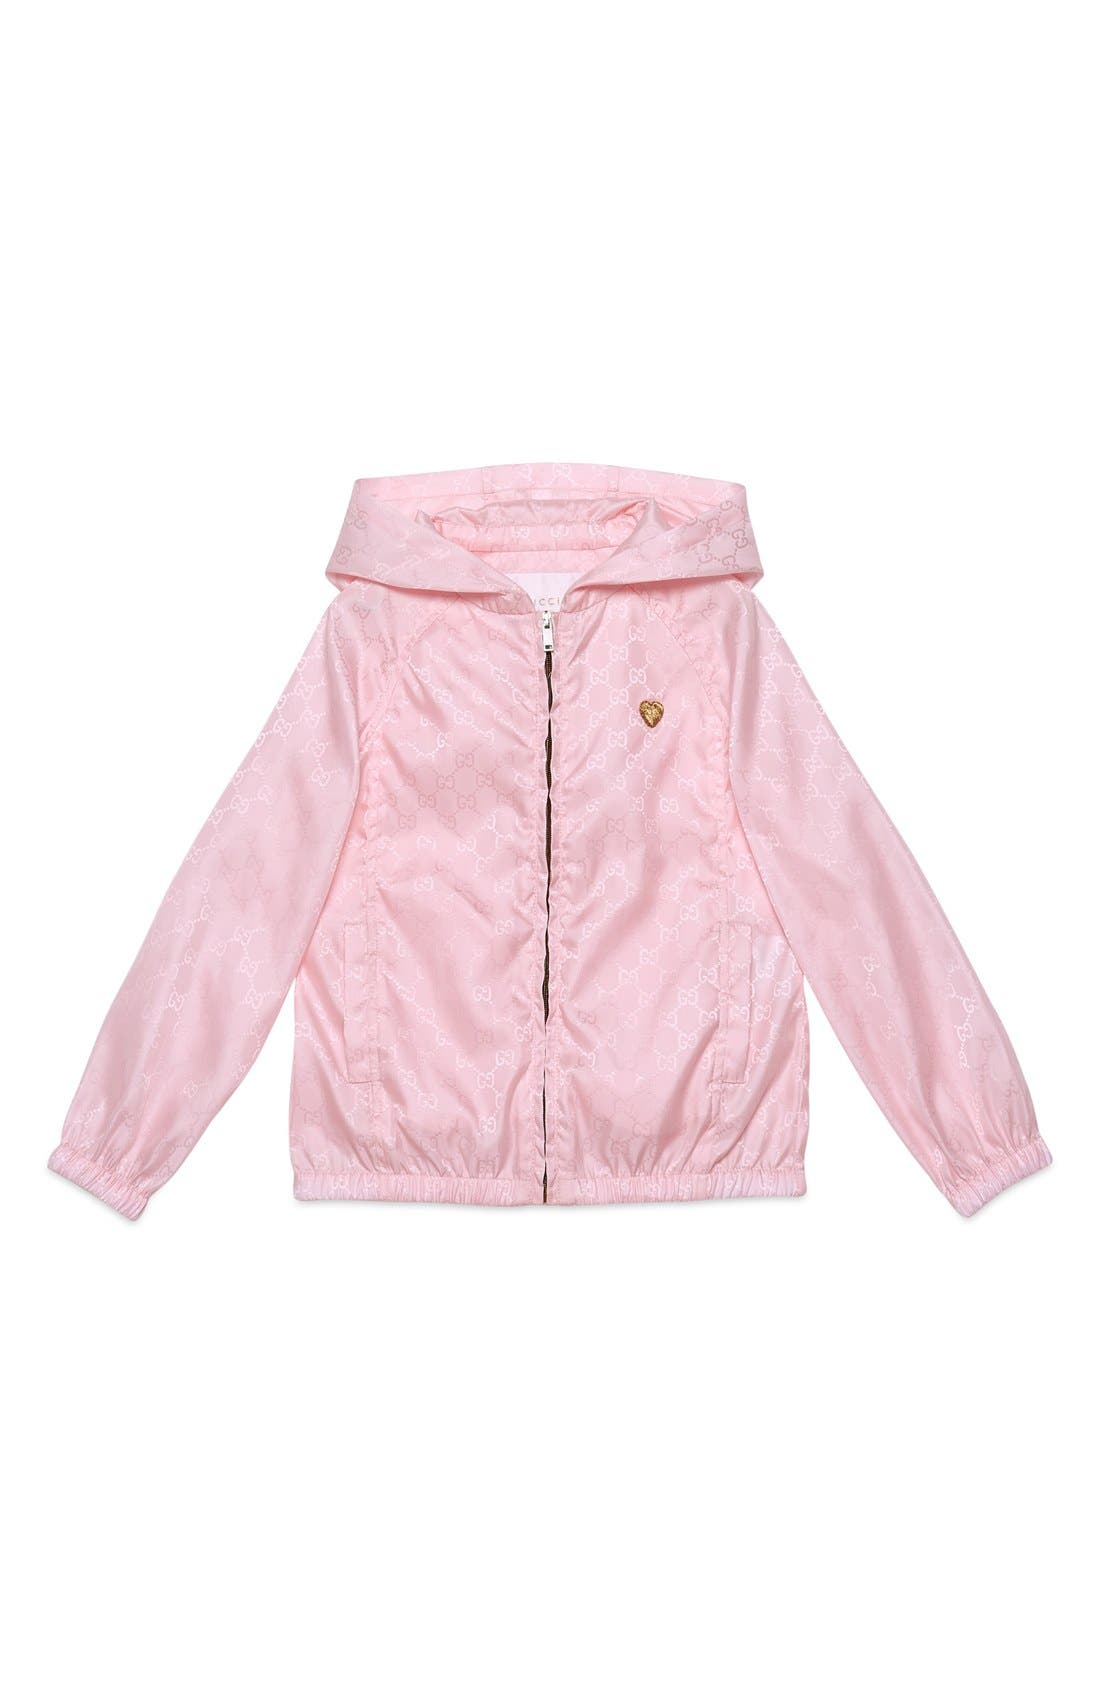 Gucci Logo Jacquard Nylon Jacket (Little Girls & Big Girls)